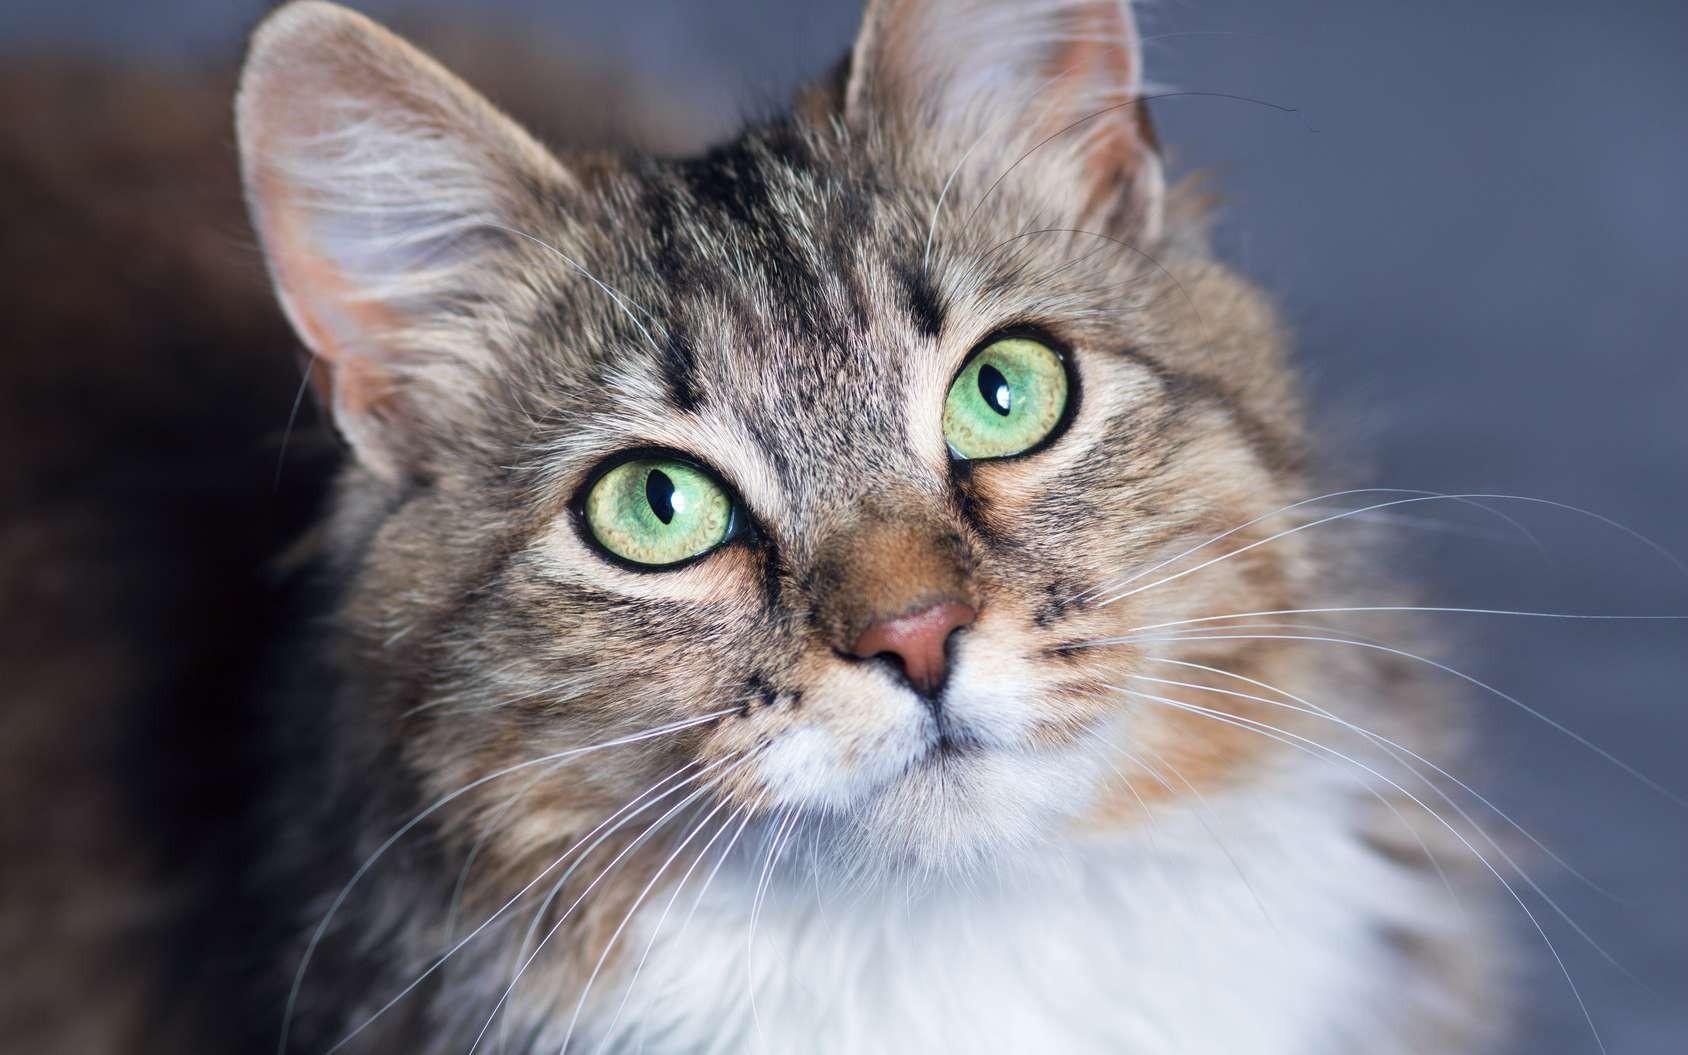 Les chats - Vrai ou faux